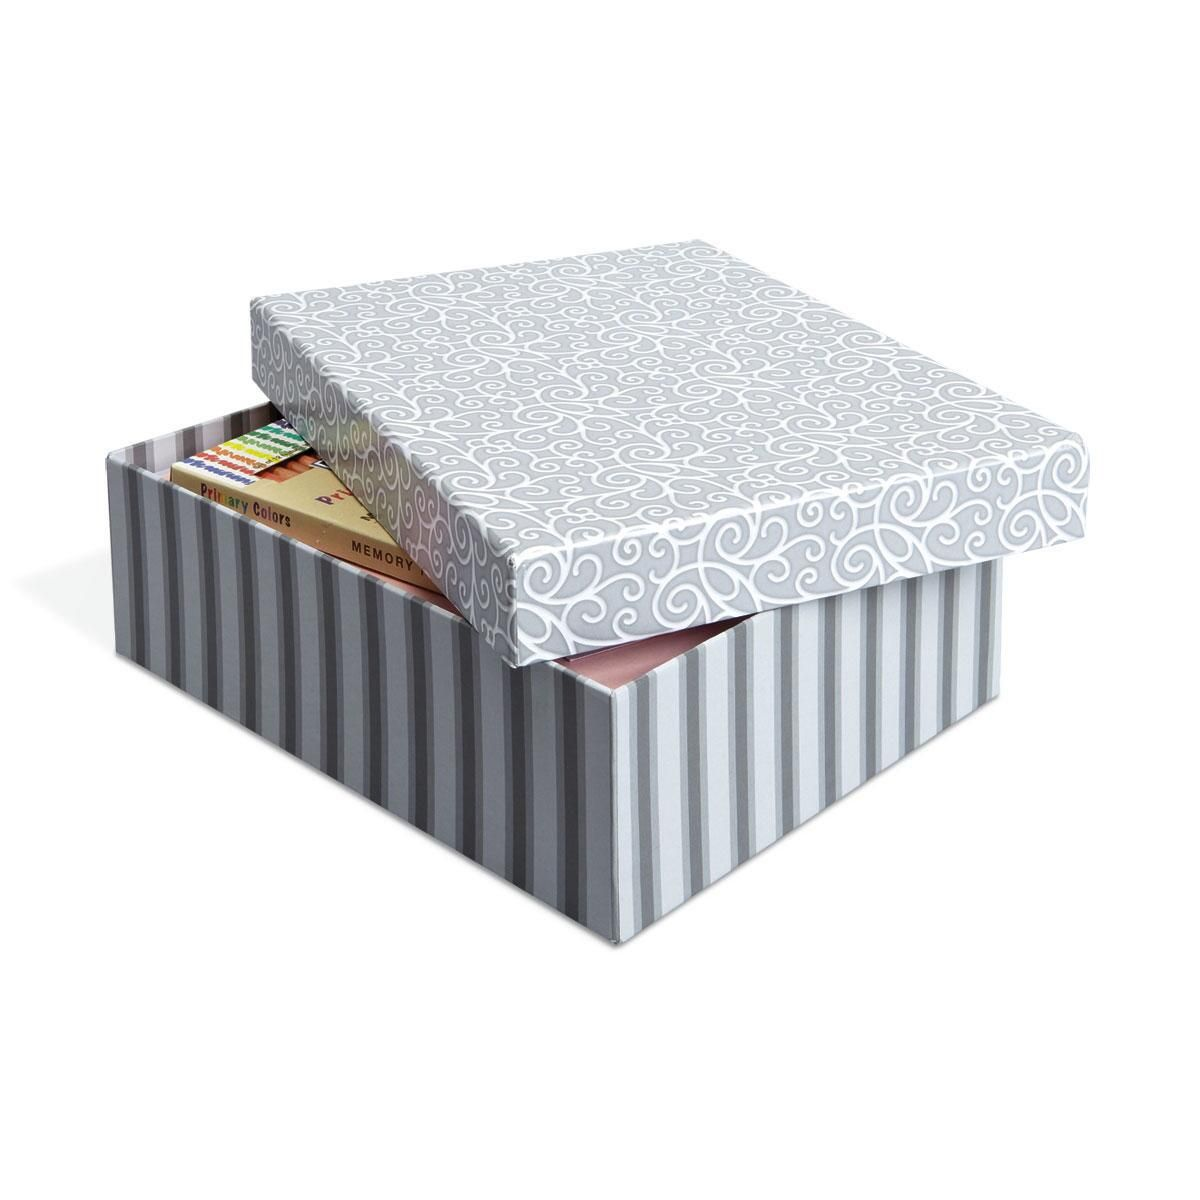 Gray & White Desk Organizer Box